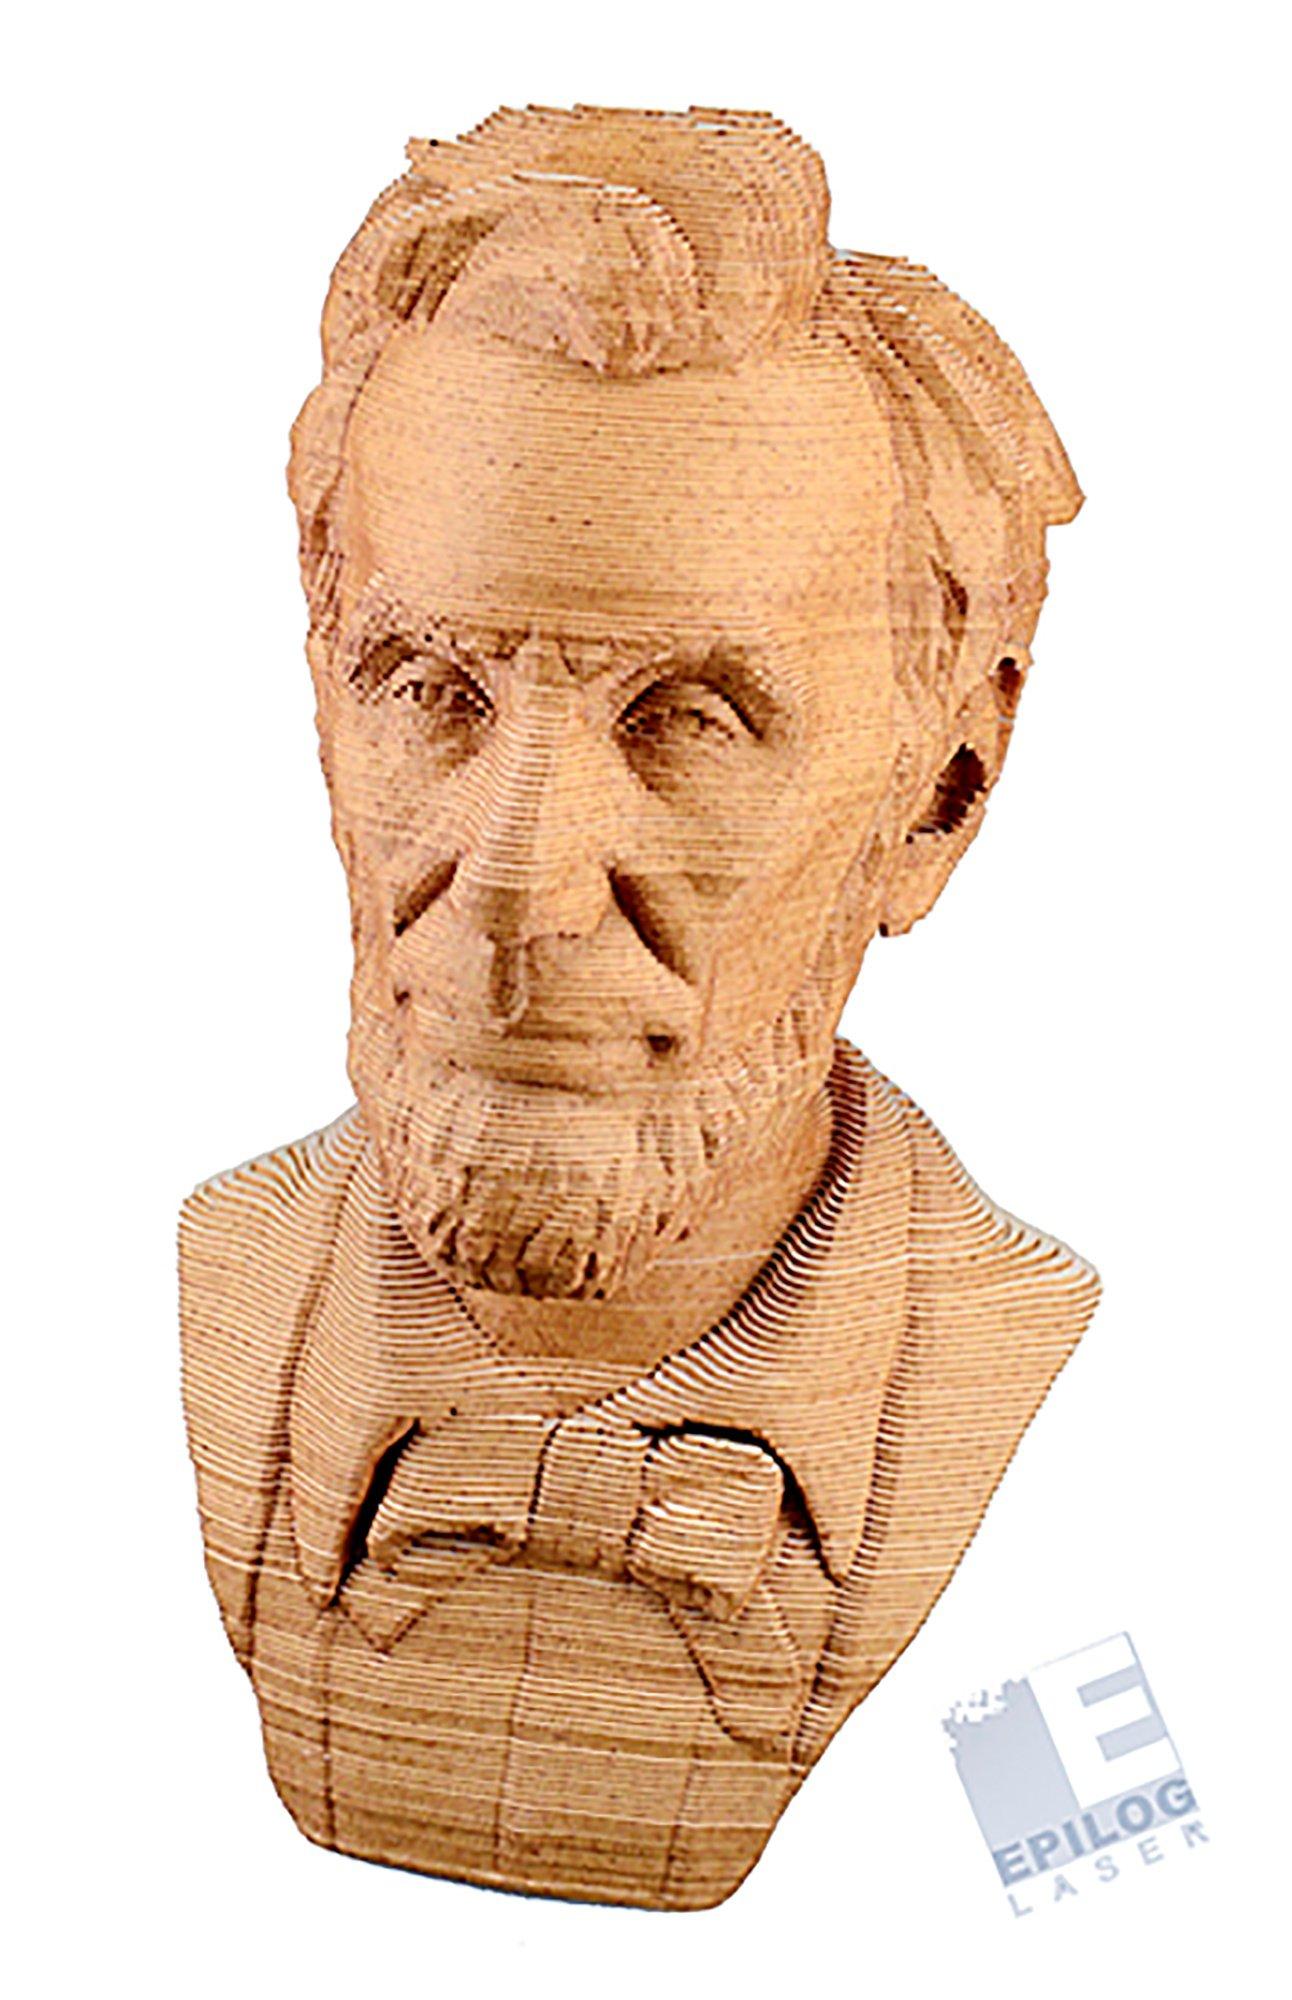 Laser cutter laminated Taskboard layers head of Lincoln